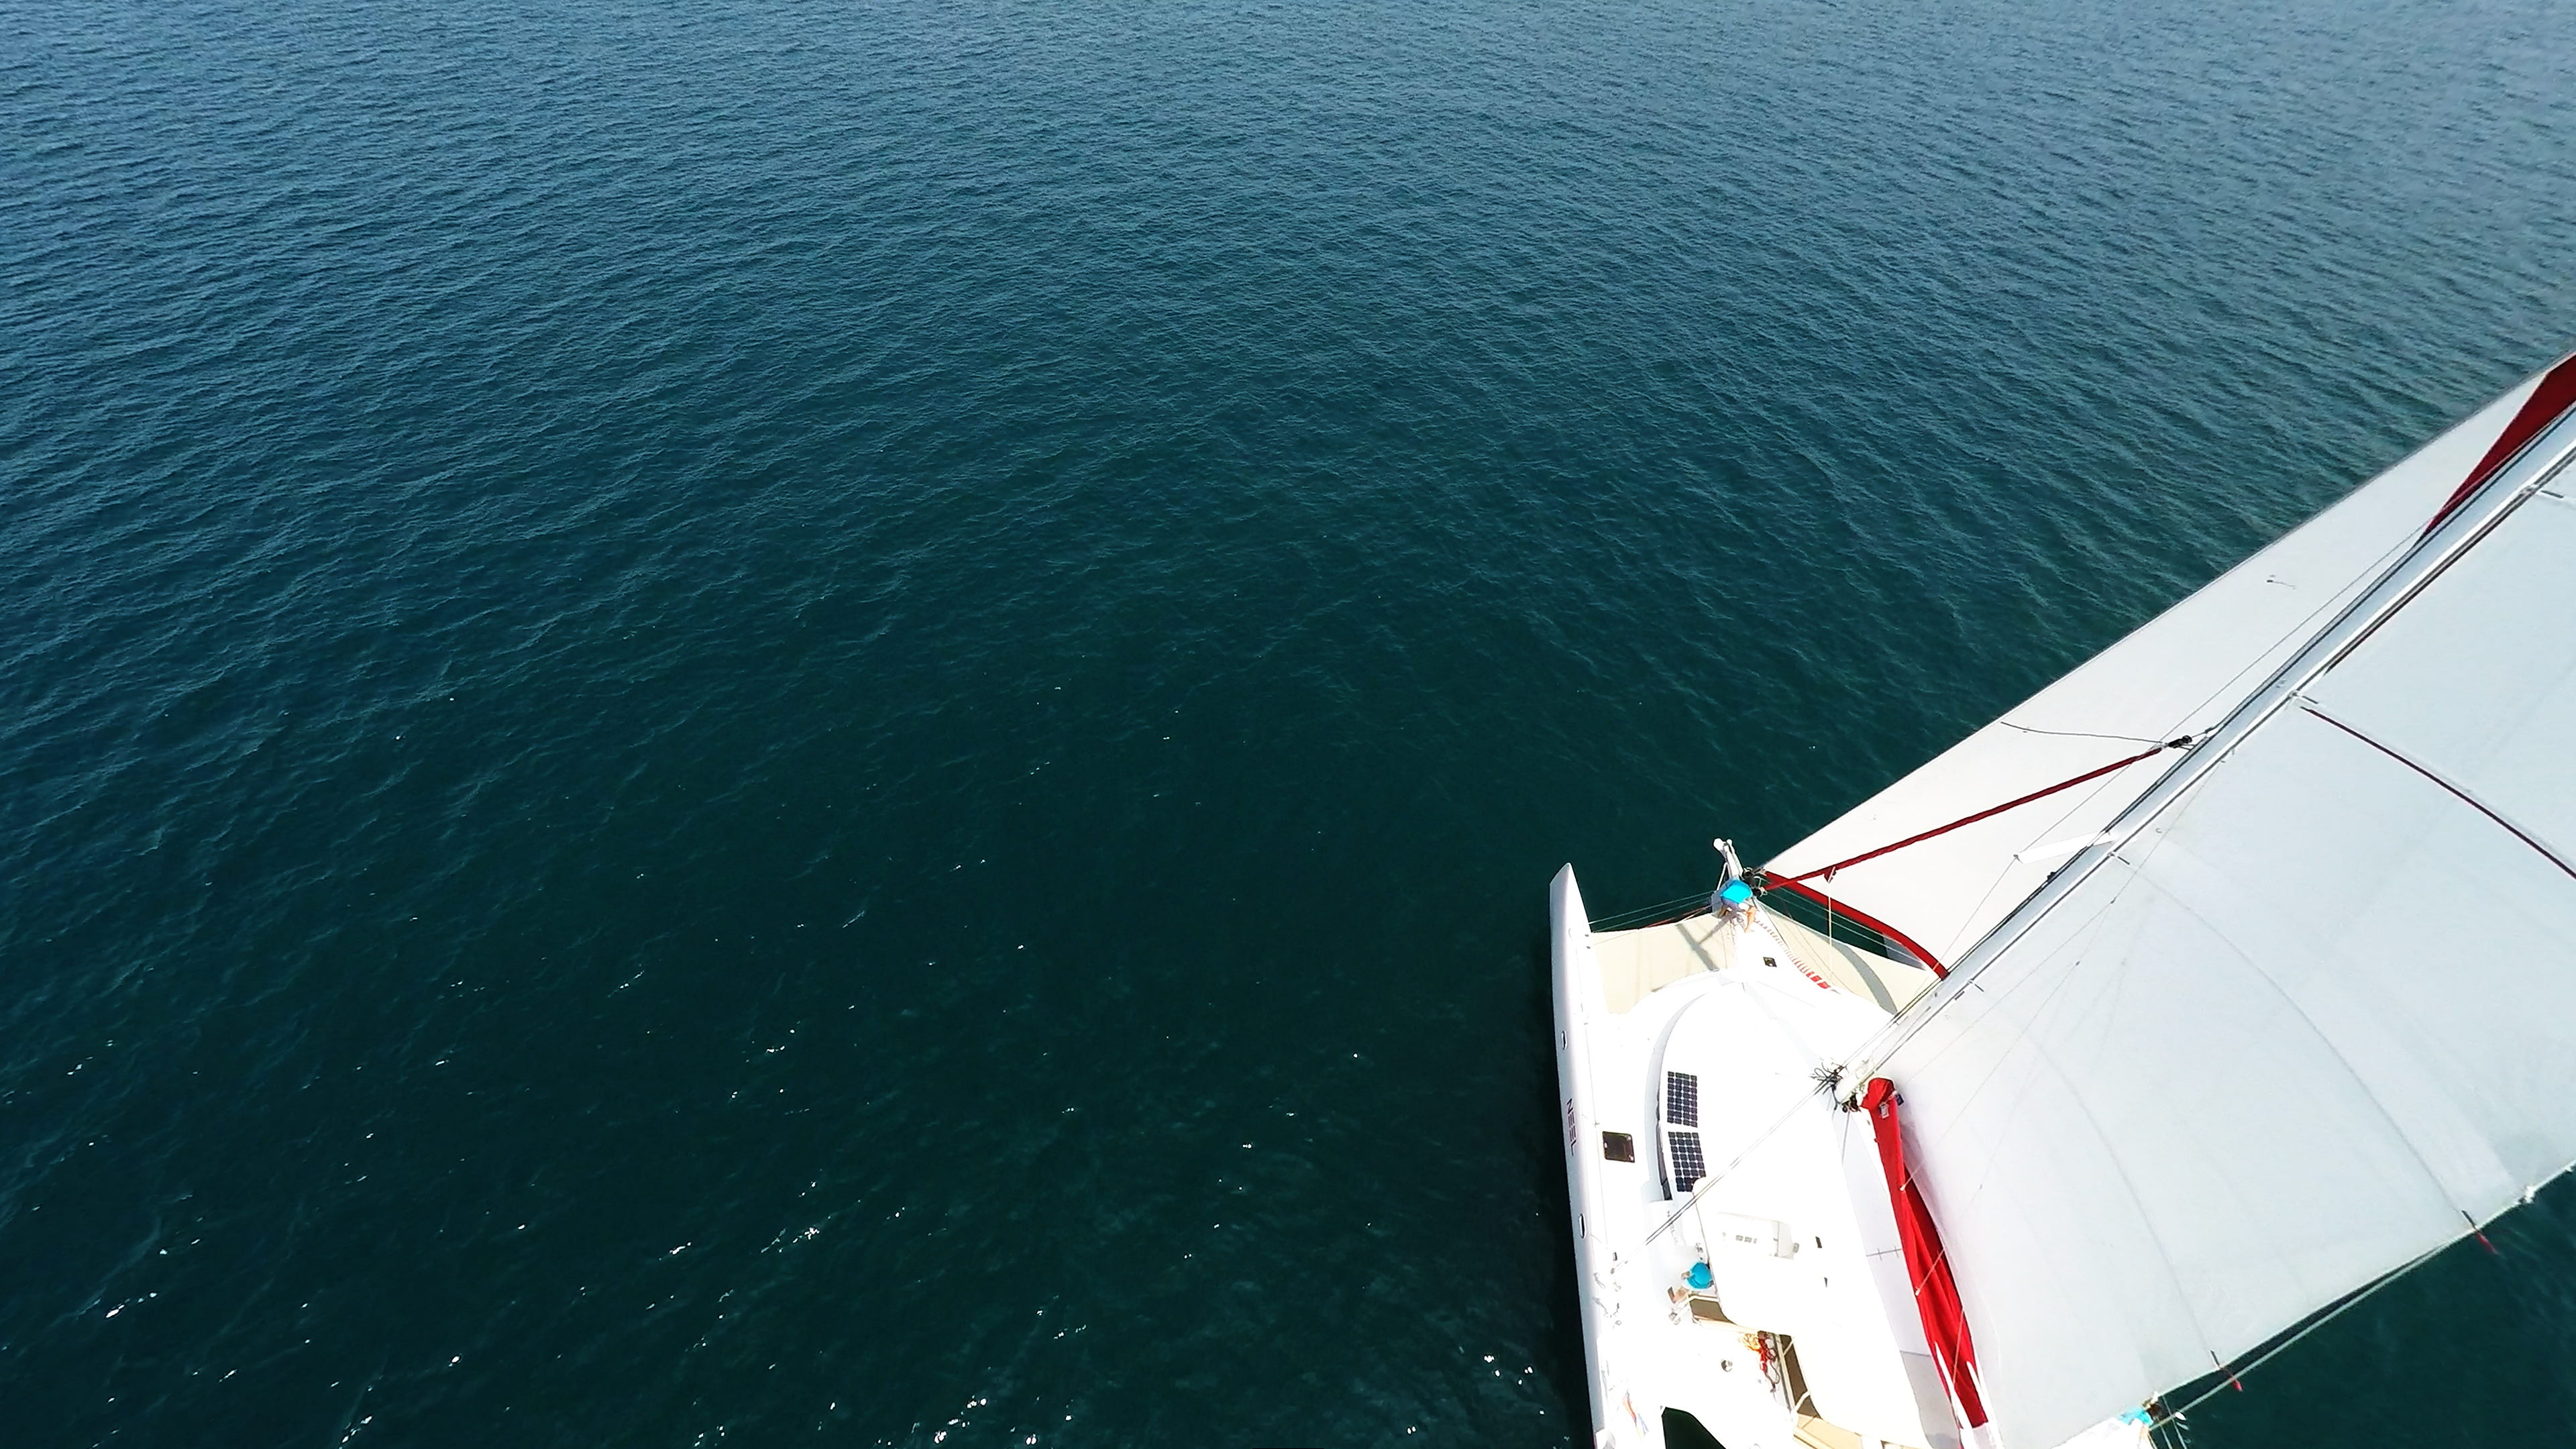 trimarano fondo blu mare